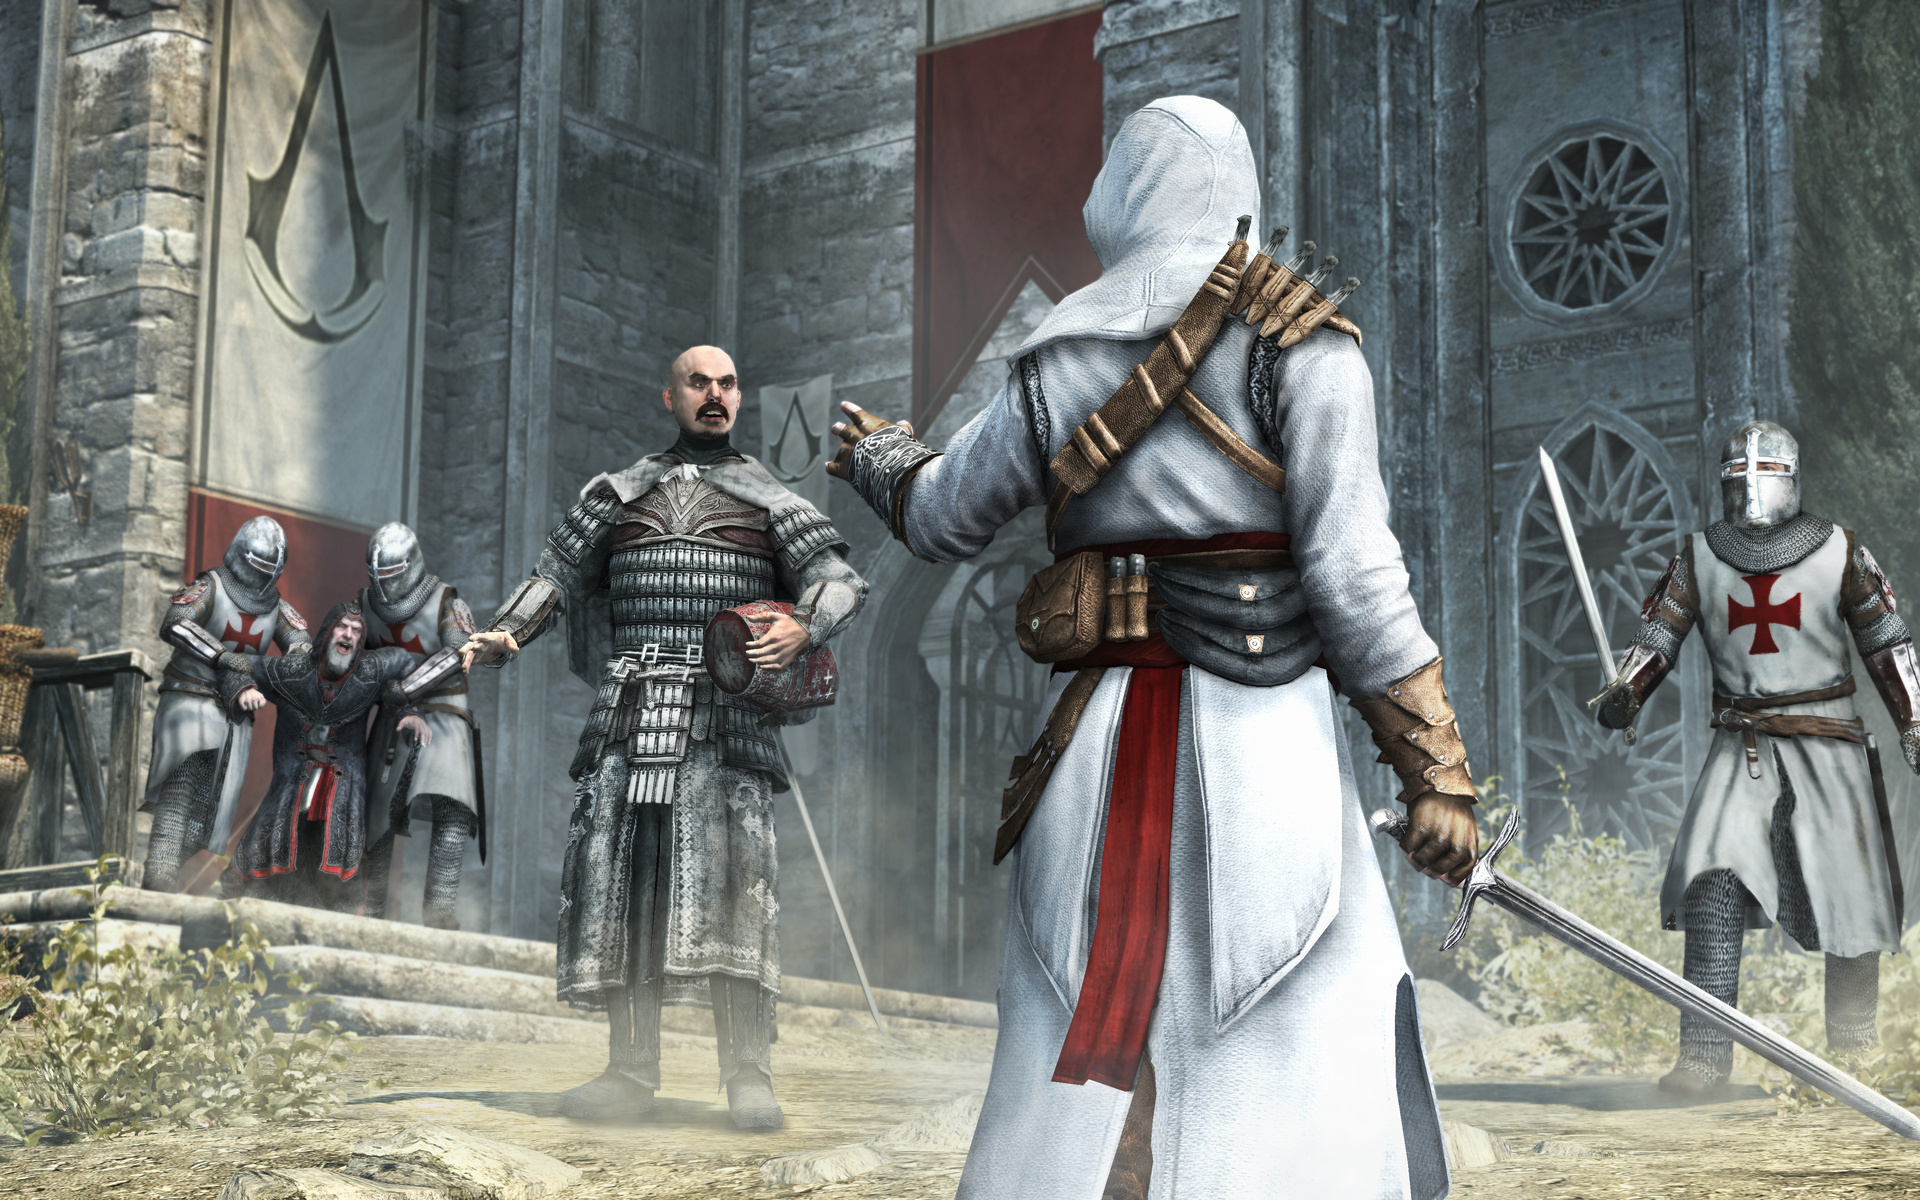 Knights Templar Of Today